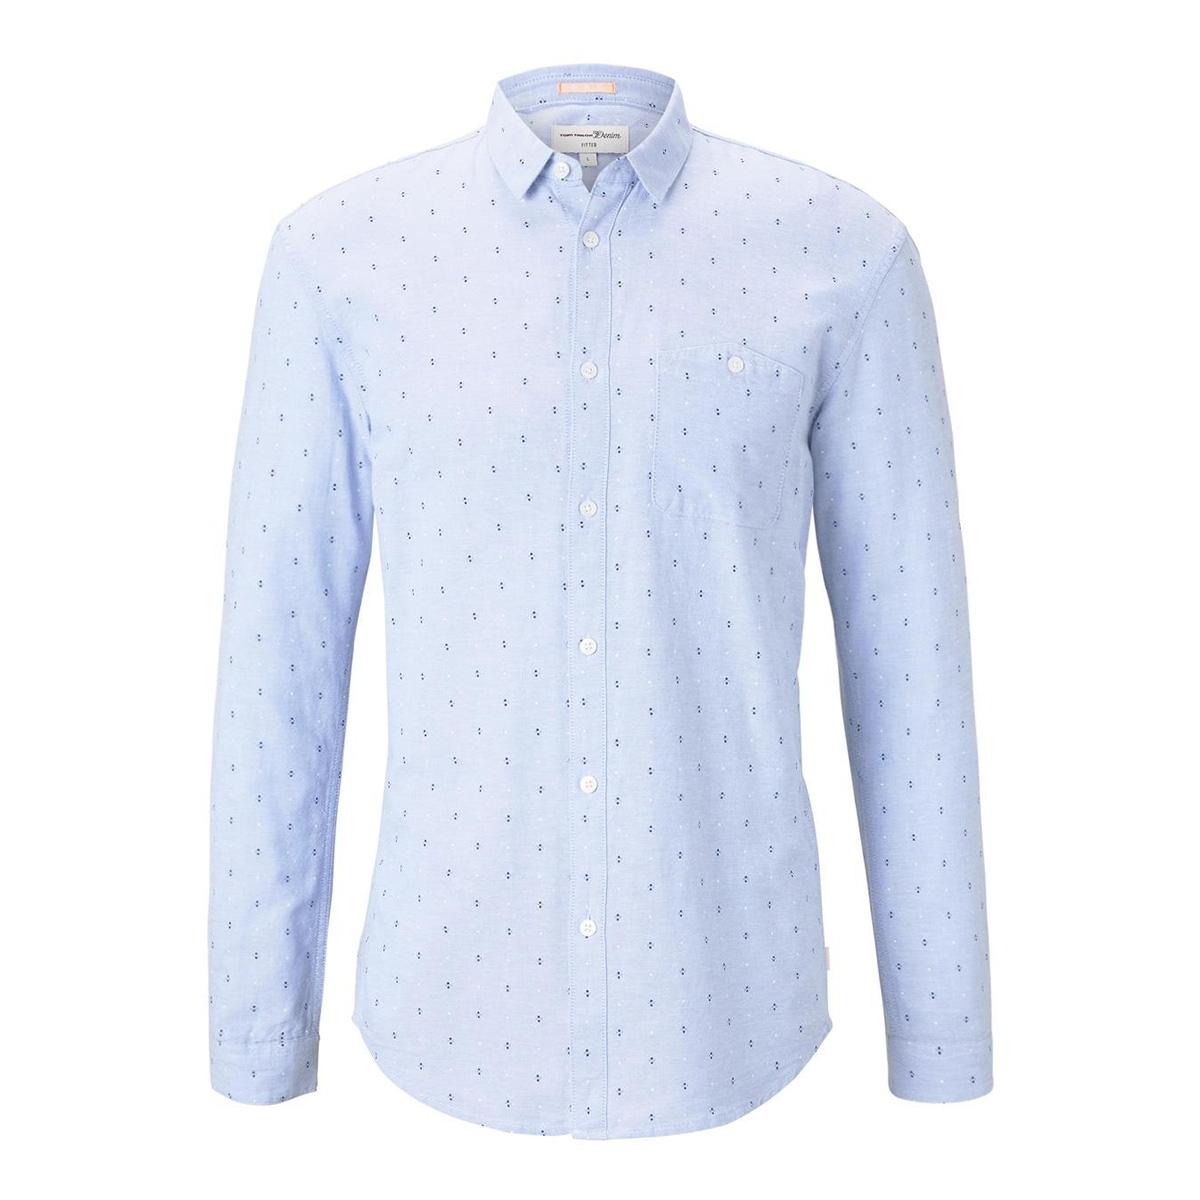 overhemd met print 1018800xx12 tom tailor overhemd 22910